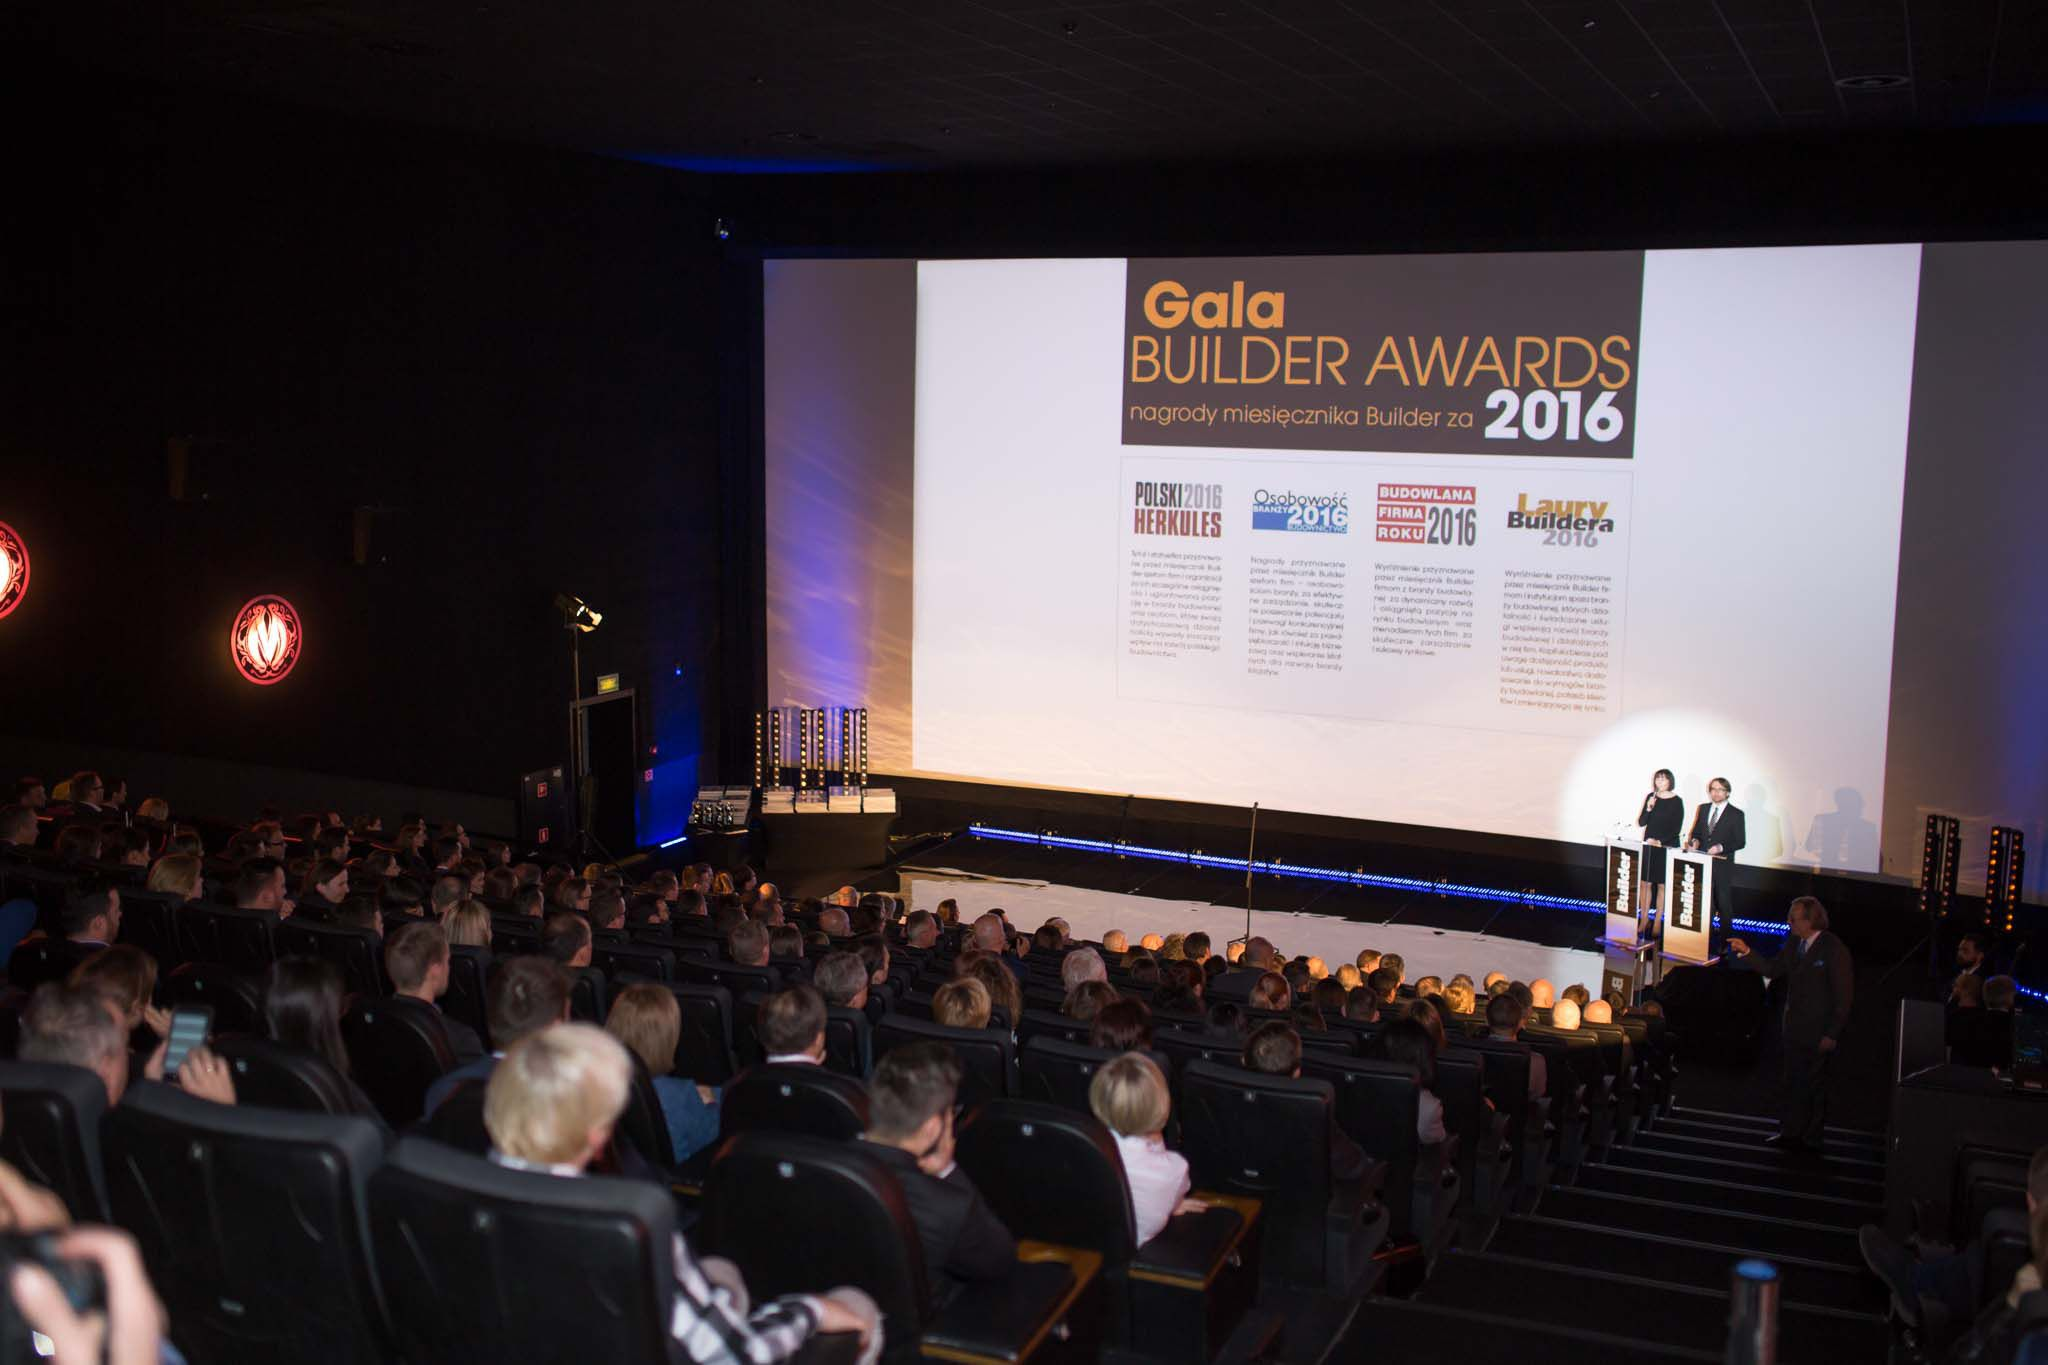 gala builder awards 2016